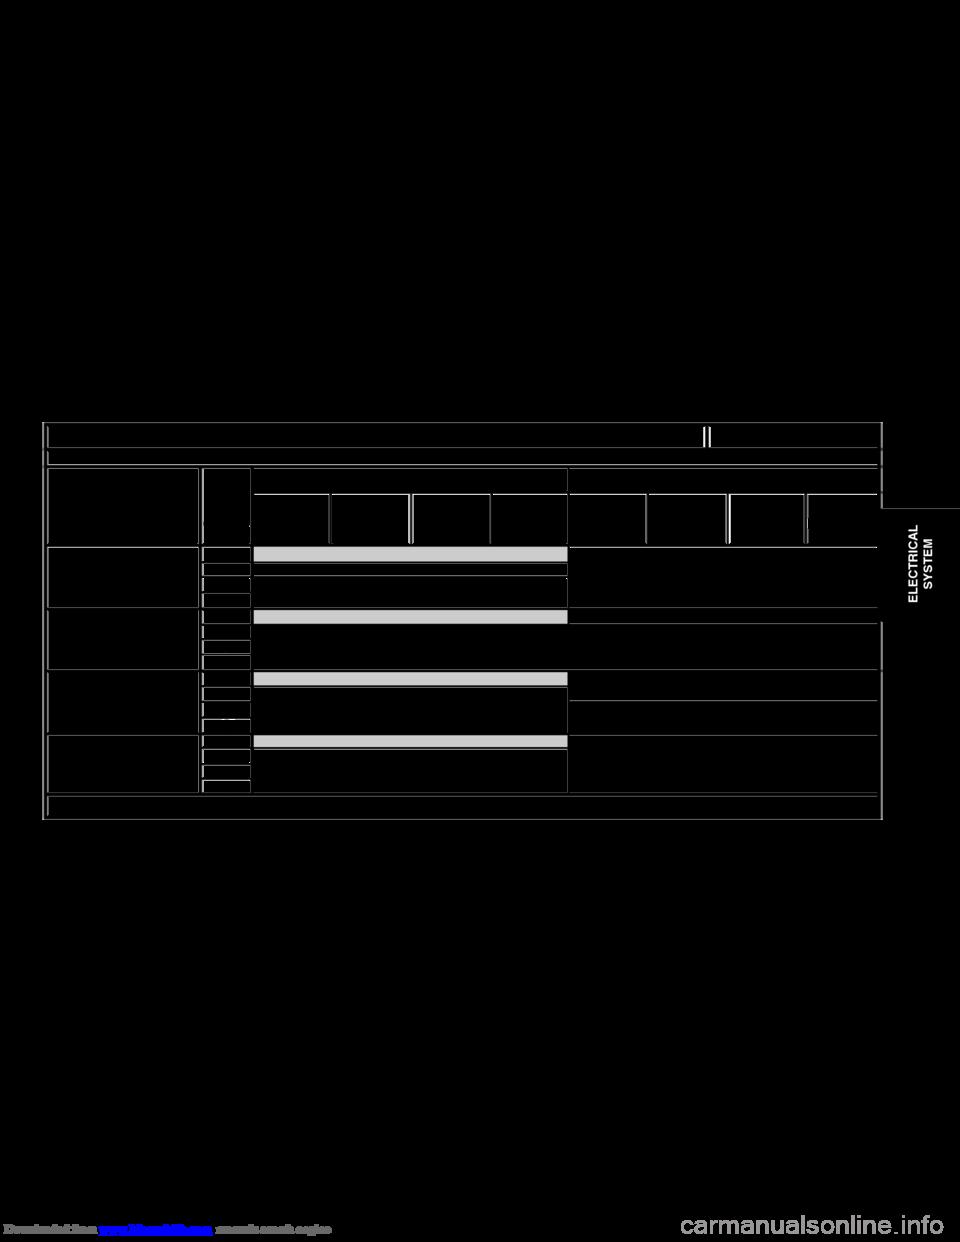 Engine Citroen Xsara Picasso 2004 1g Workshop Manual 2 0 Hdi Diagram Page 483